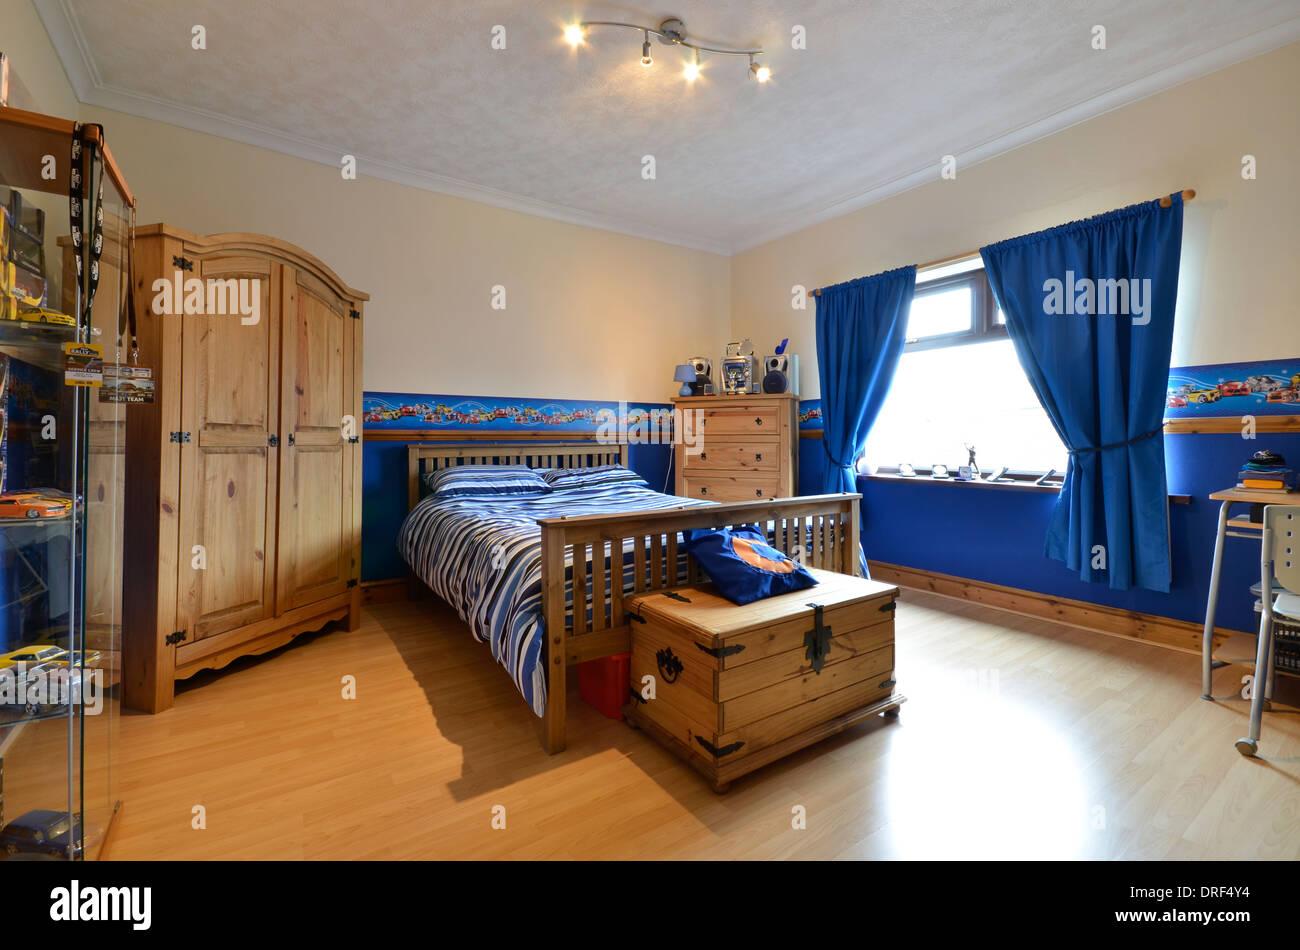 Teenage boy bedroom in blue with pine wardrobe - Stock Image